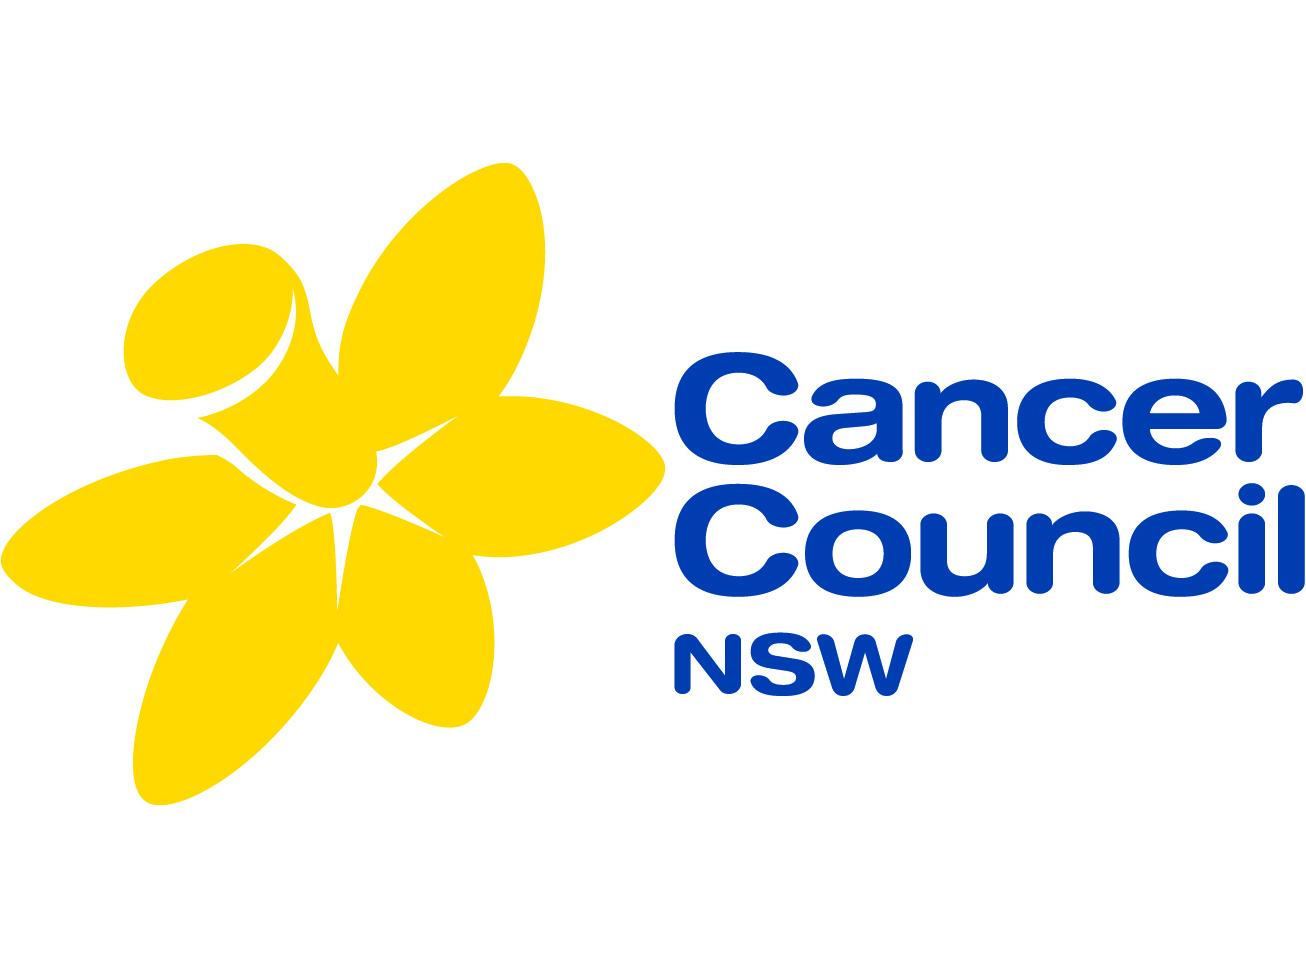 CC_NSW_CMYK.jpg